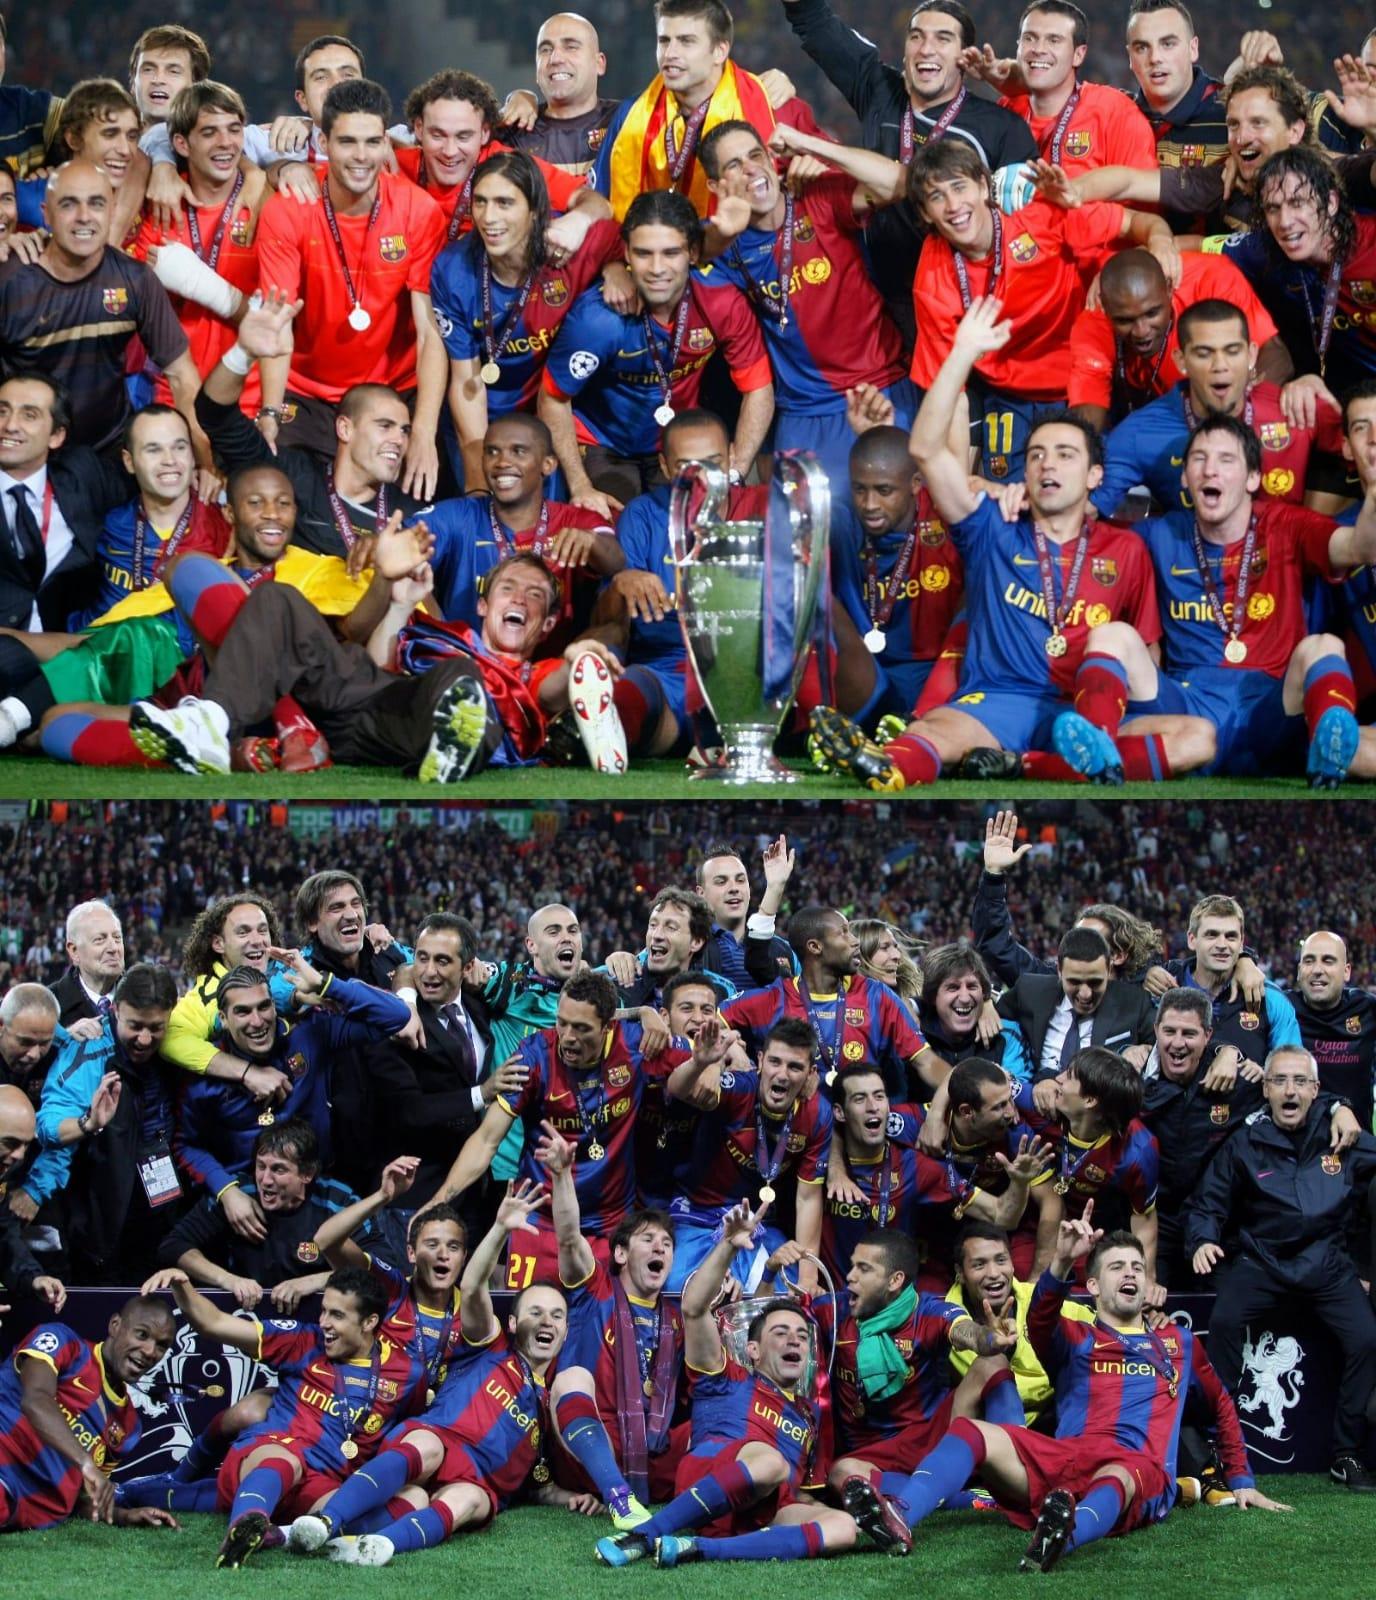 Two different @ChampionsLeague finals... same happy ending!�� https://t.co/sSQtUcVyE8